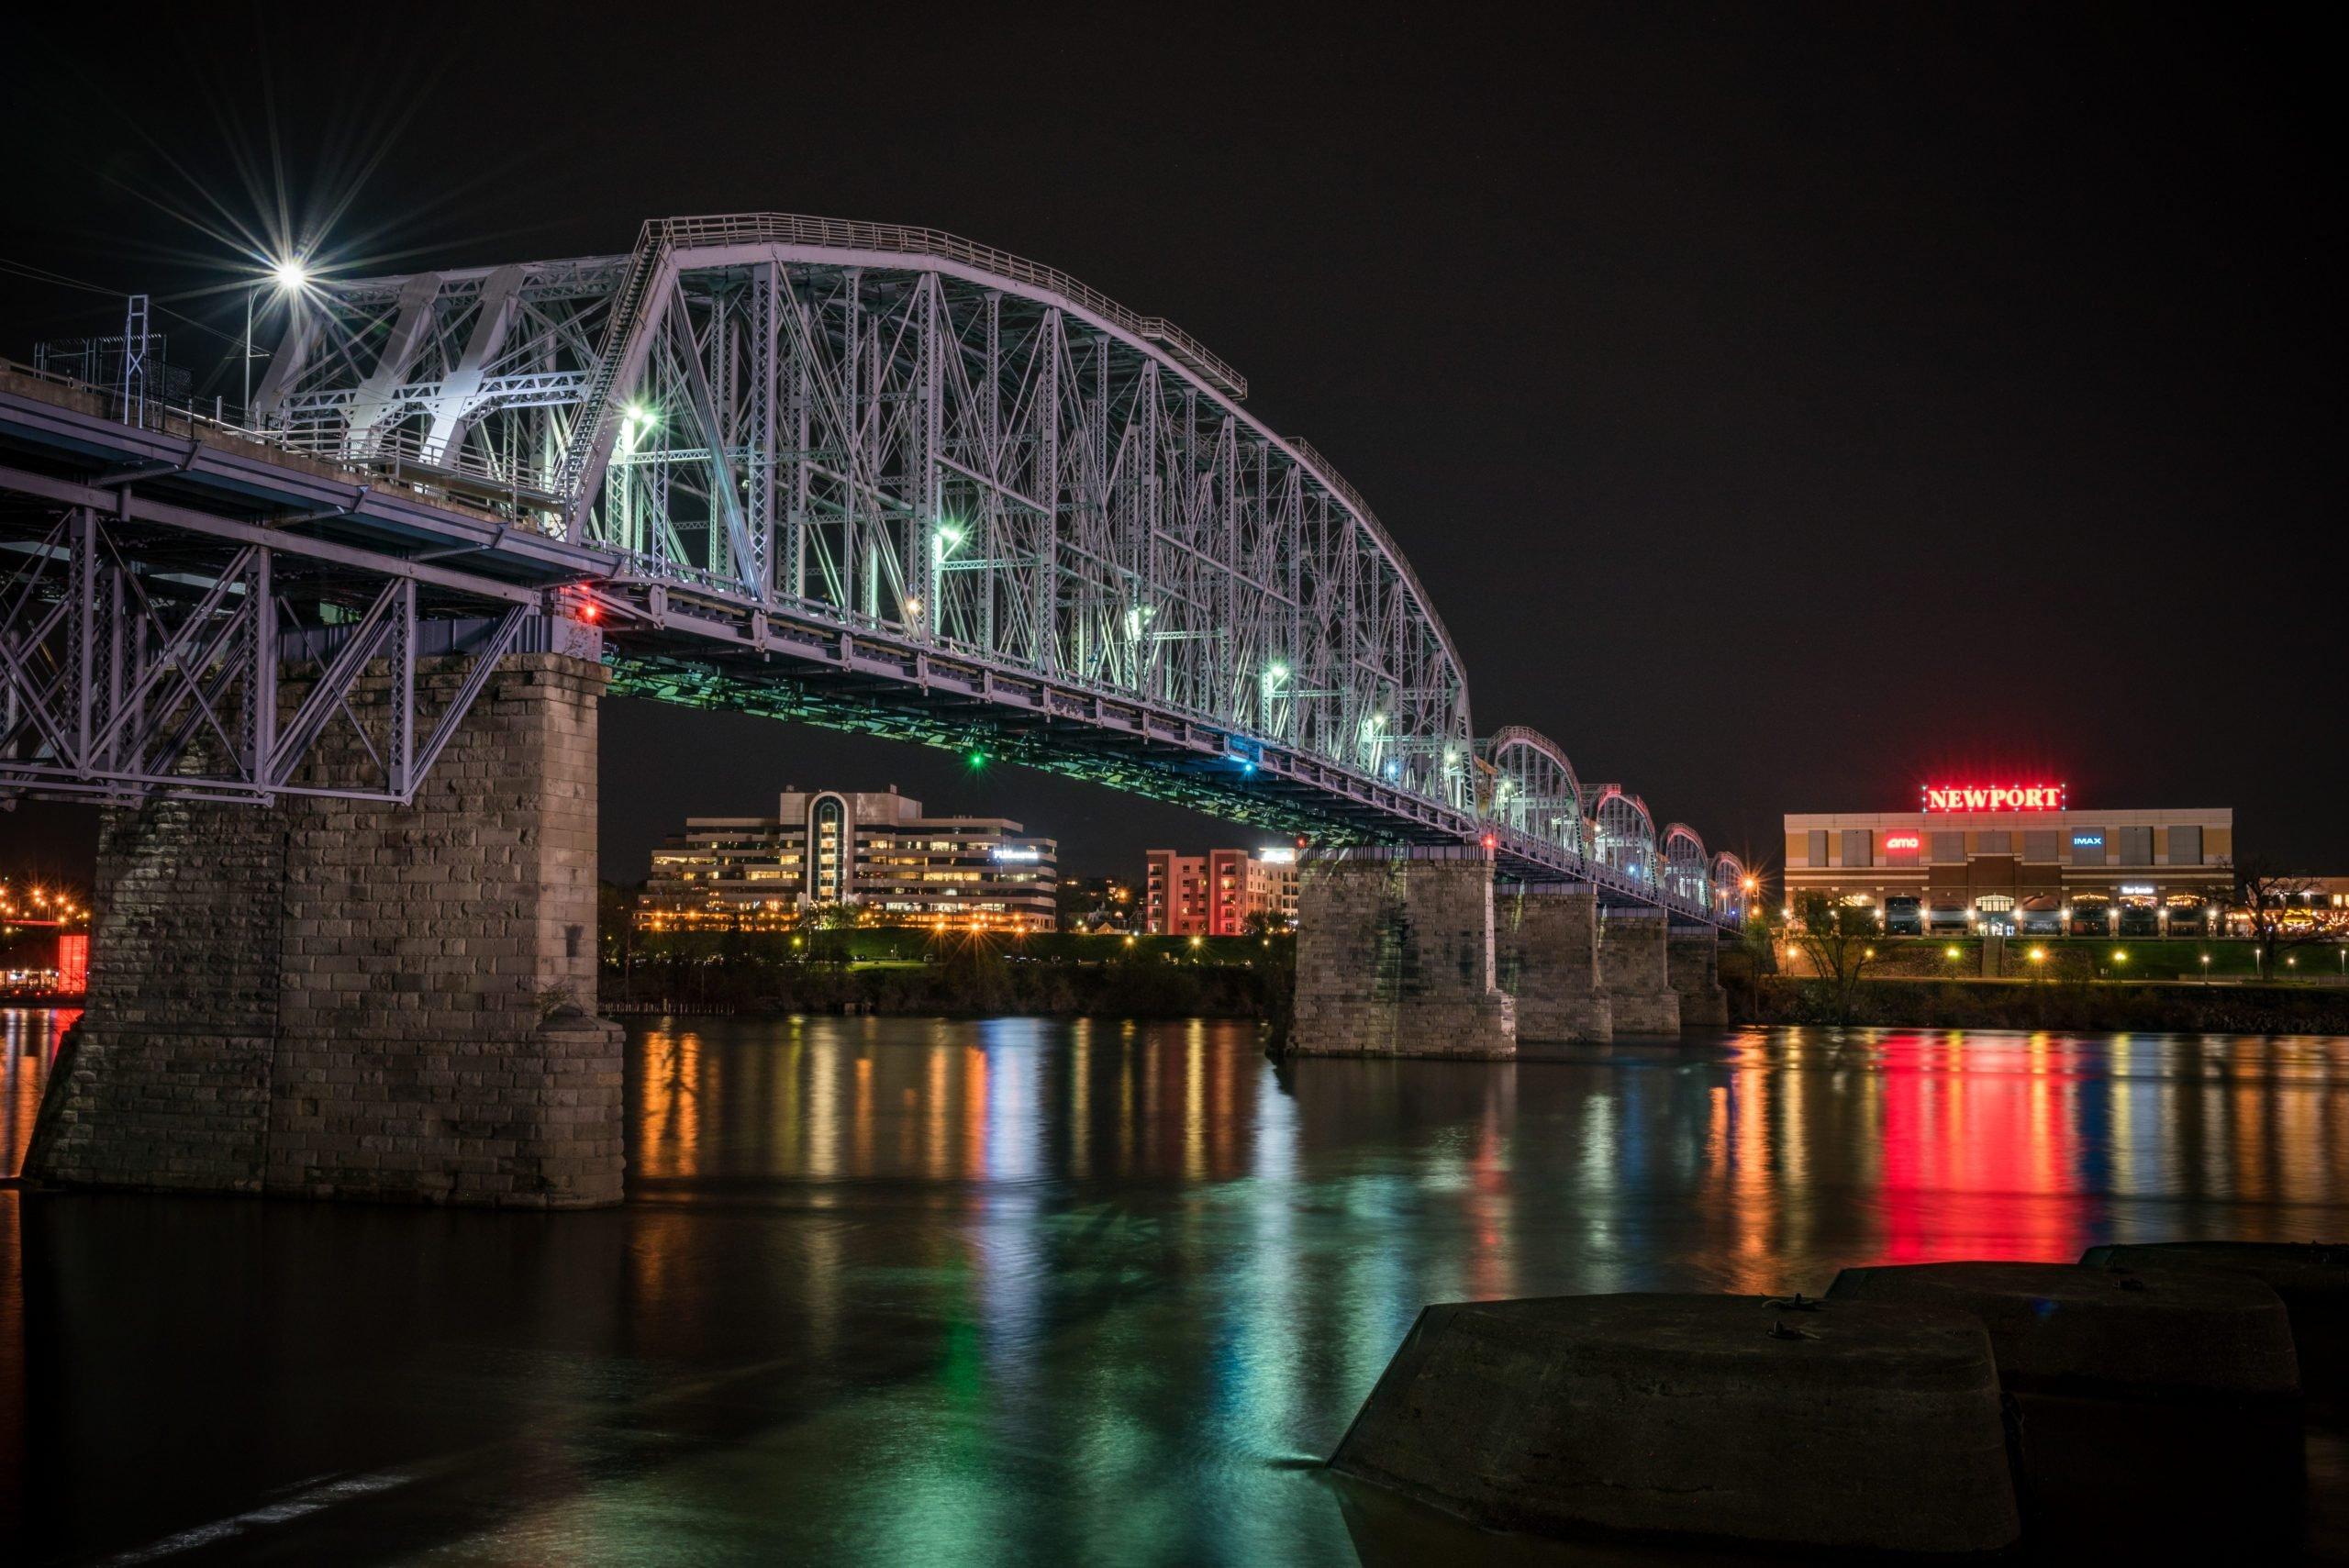 Newport Southbank Bridge/Purple People Bridge, Cincinnati, Ohio